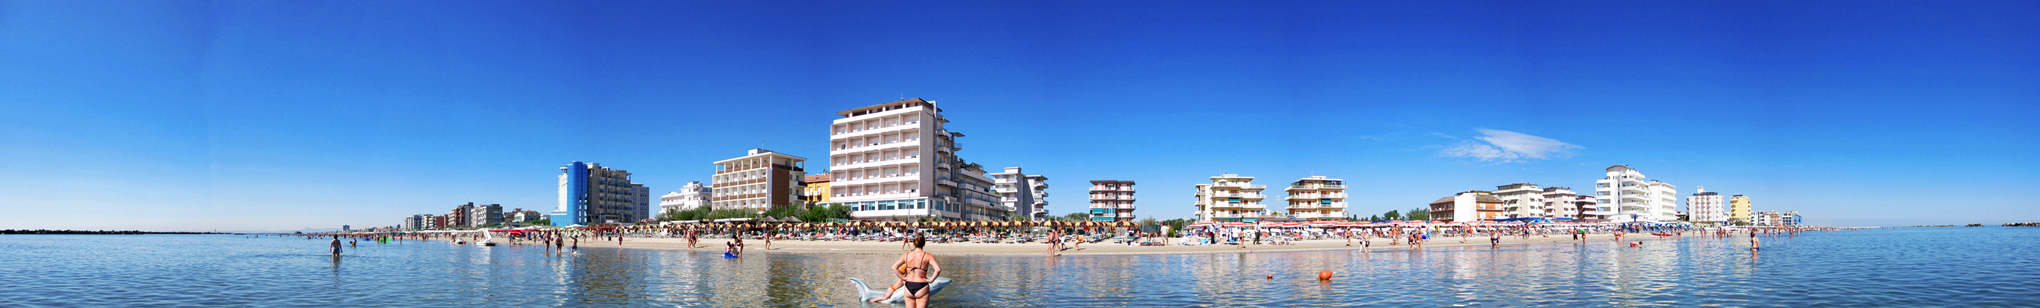 Lido di Savio Strand Panorama